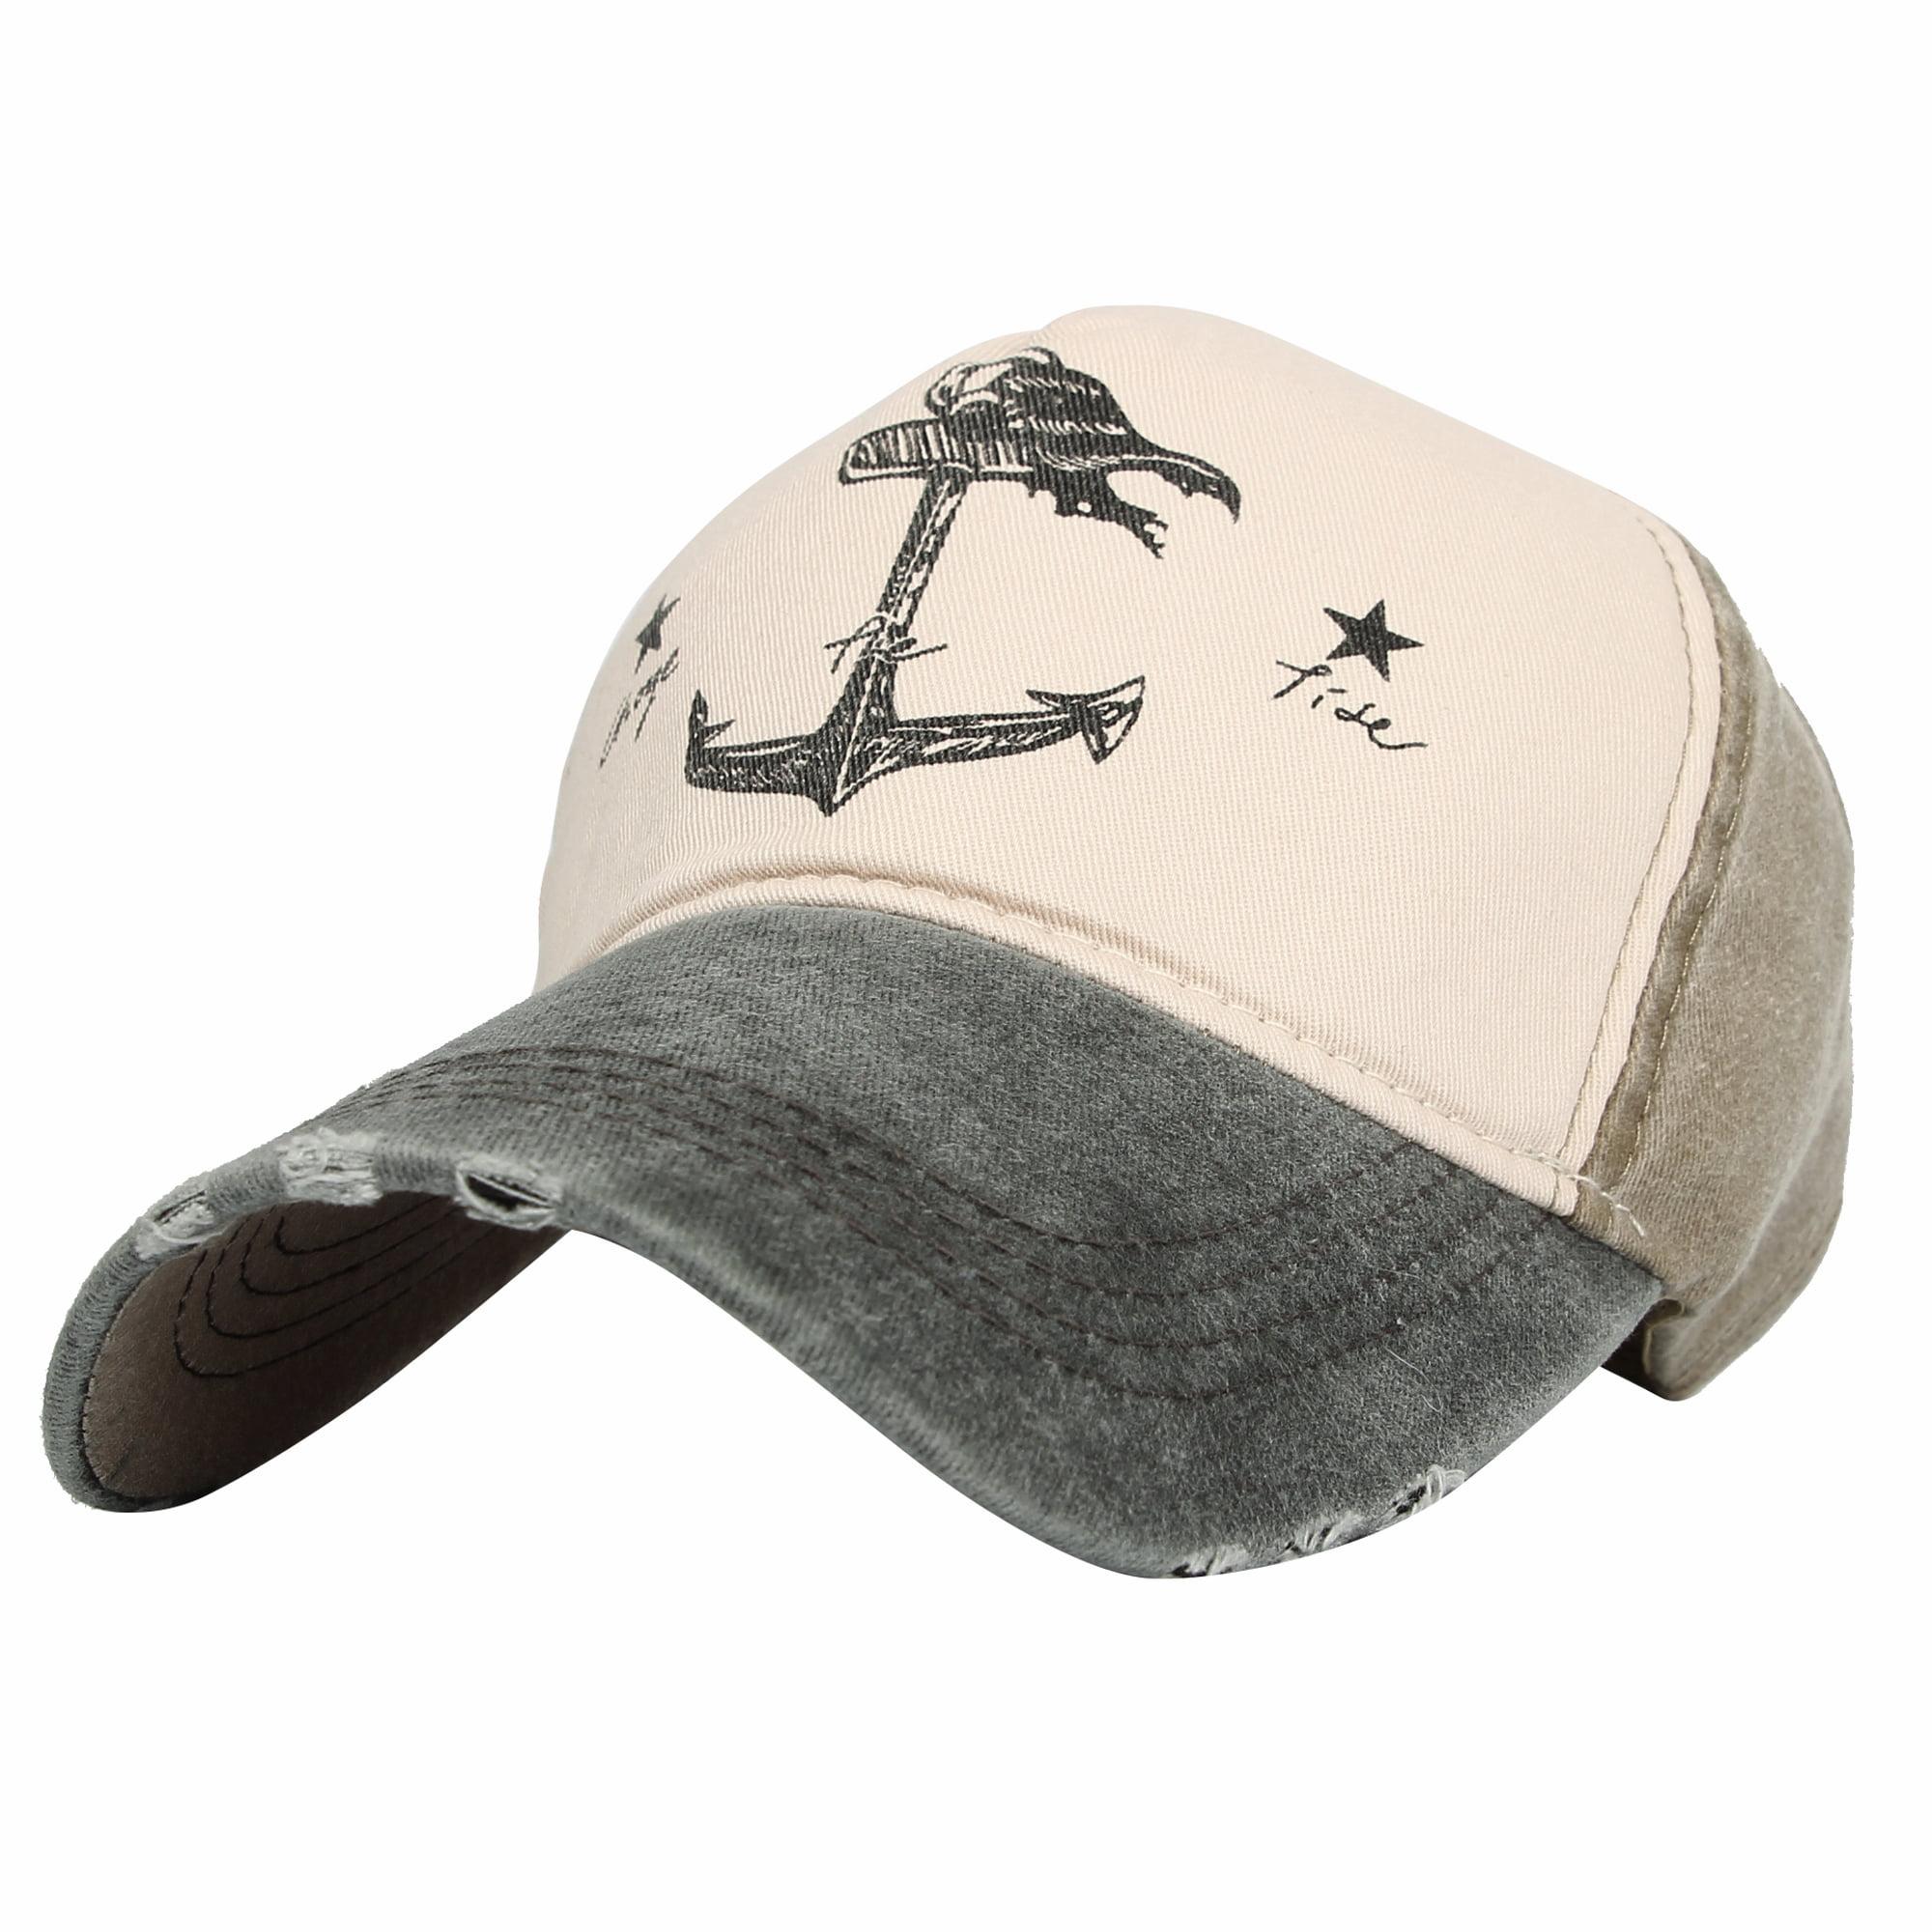 Adjustable Yarn-Dyed Denim Baseball Caps I Just Really Like Guinea Pigs OK Snapback Cap